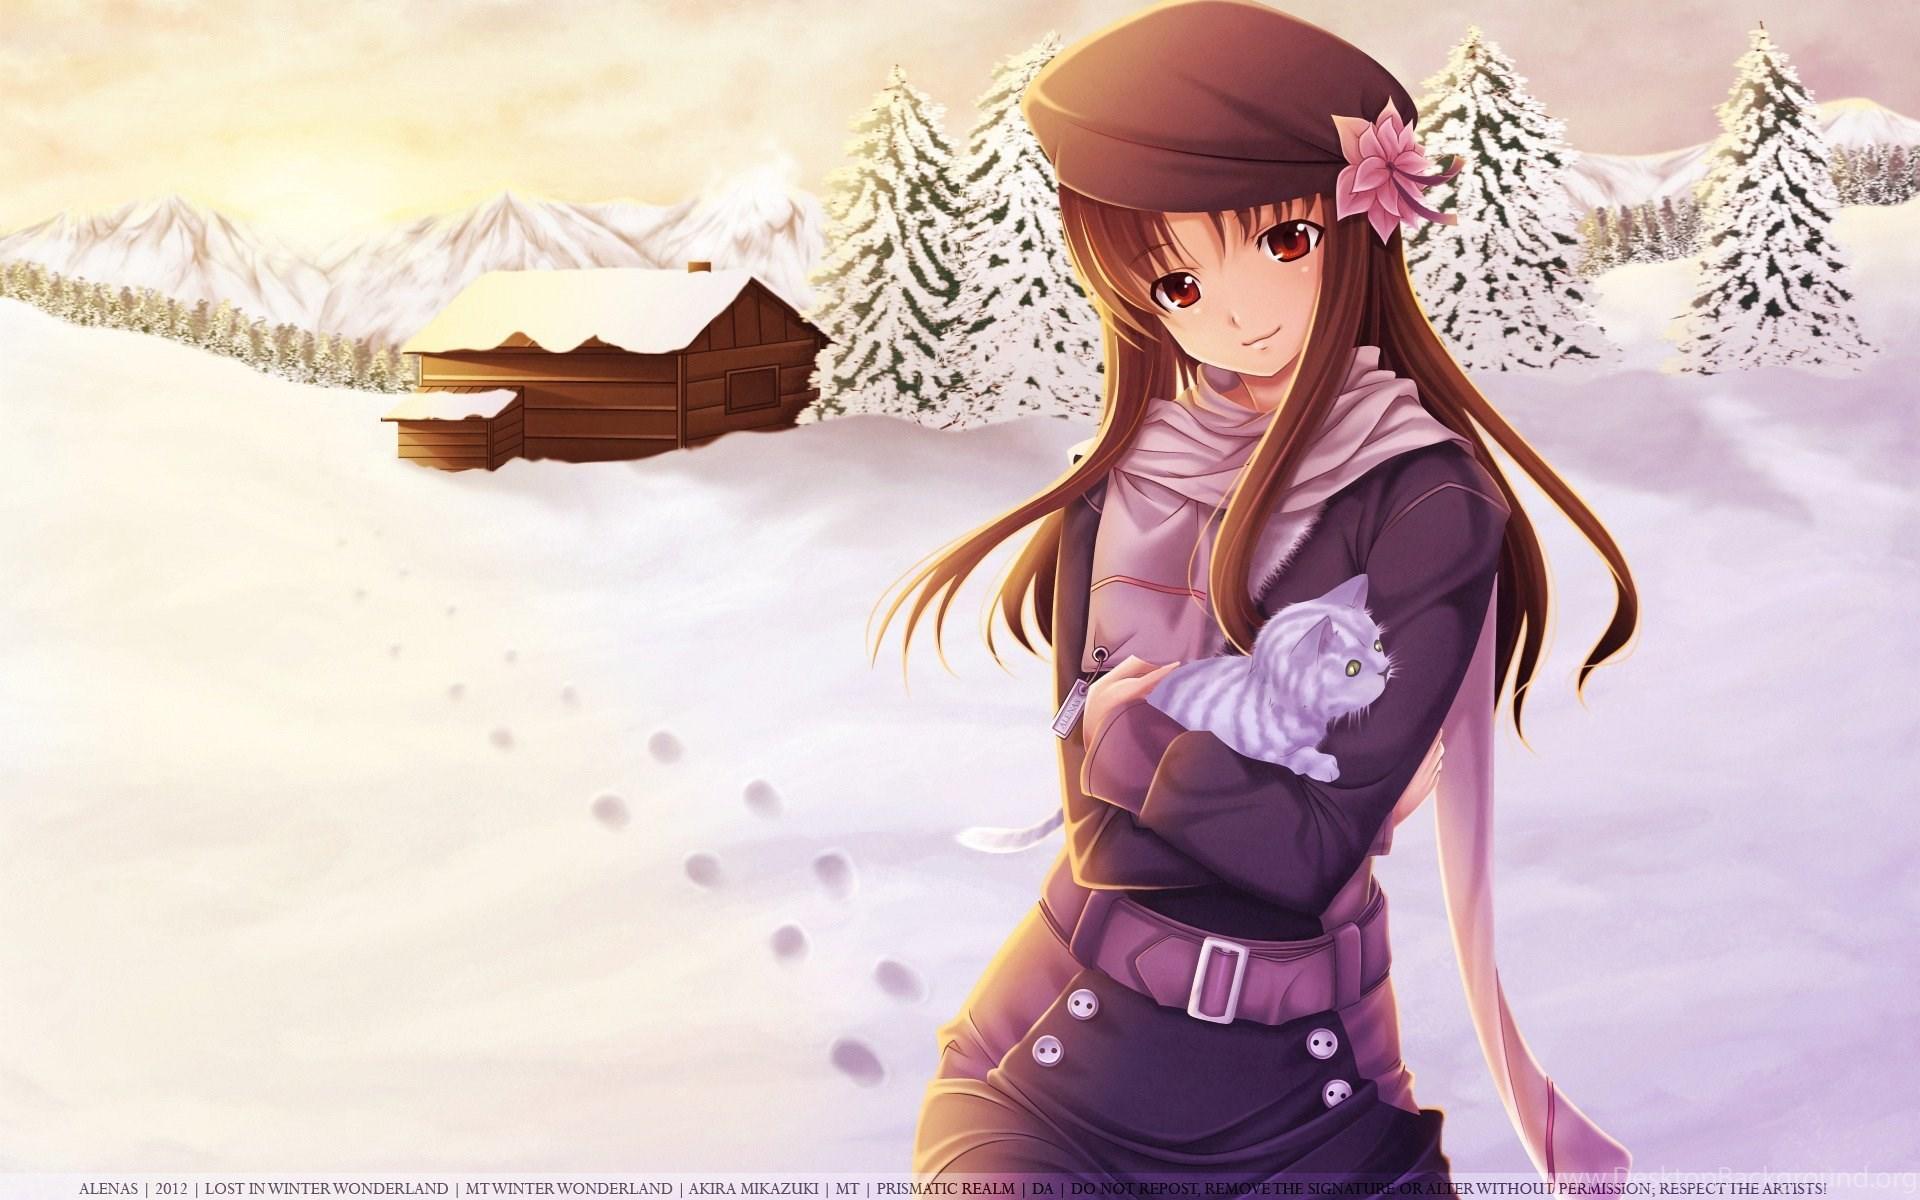 Awesome Screensavers Blog Japanese Anime Screensaver Desktop Background